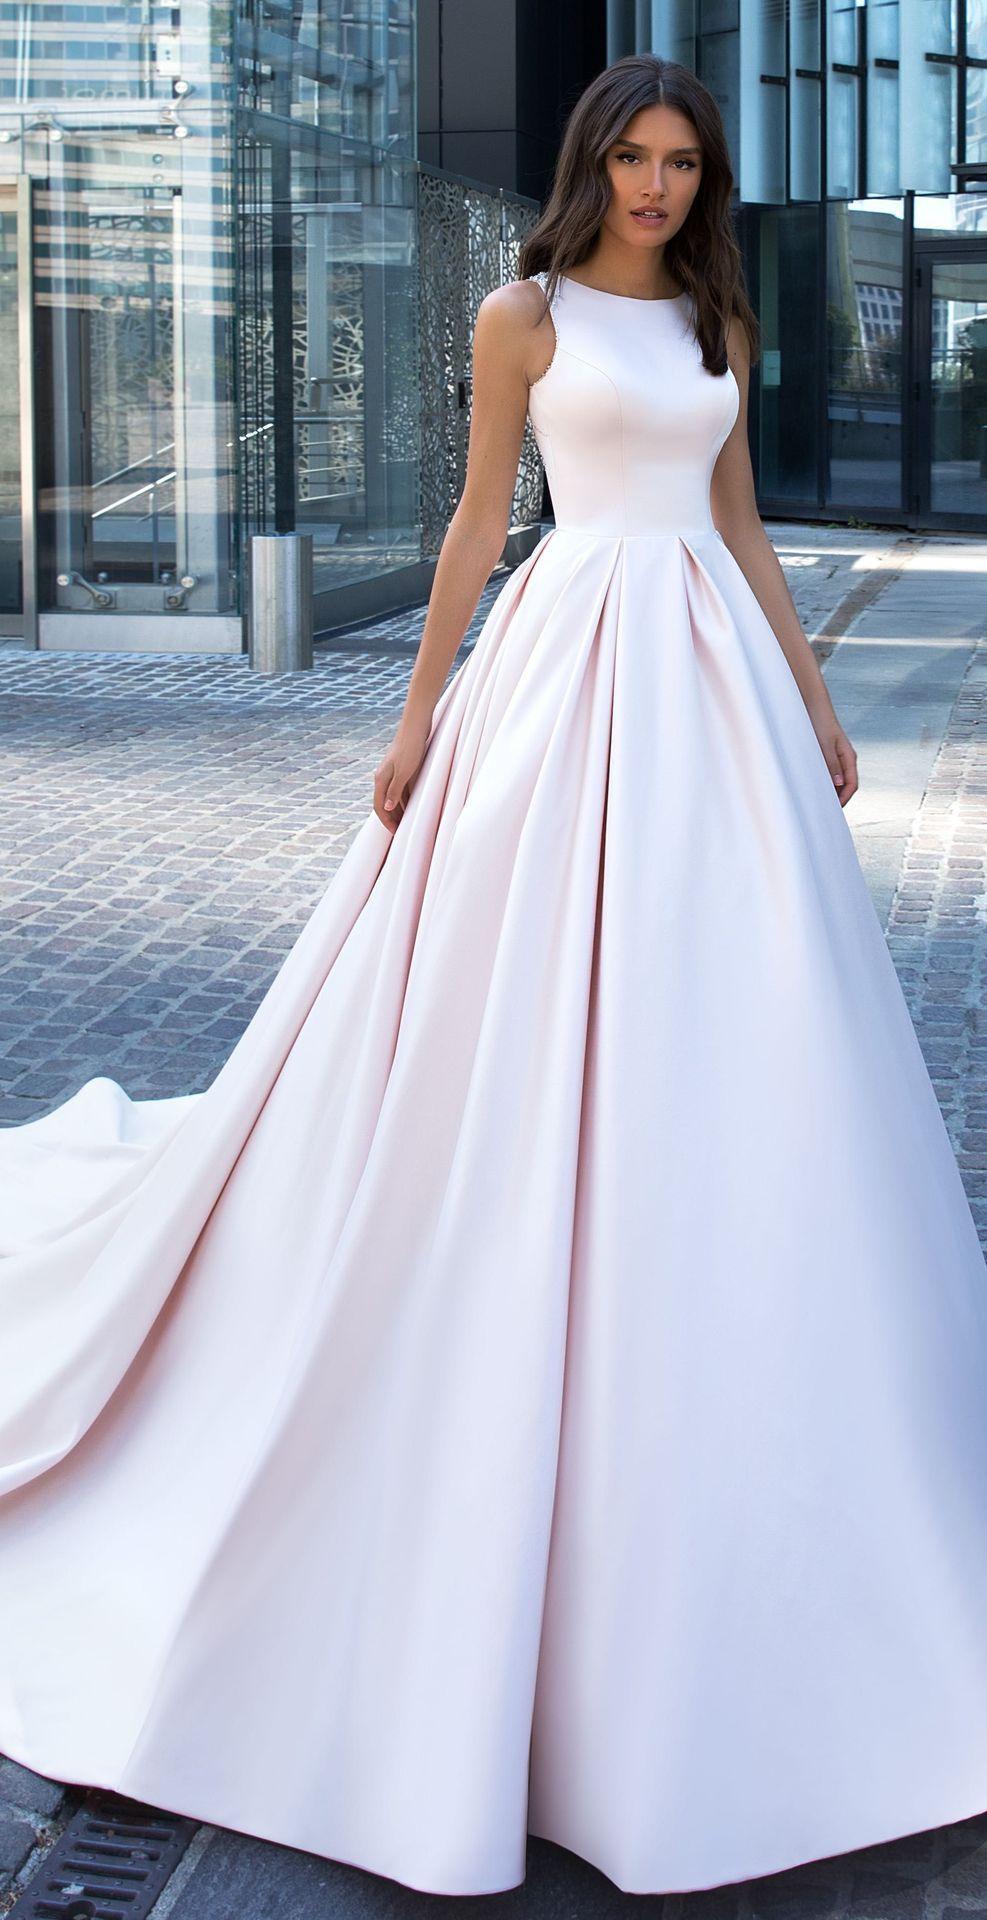 Crystal Designs Wedding Dresses 2019 - Paris Collection ...